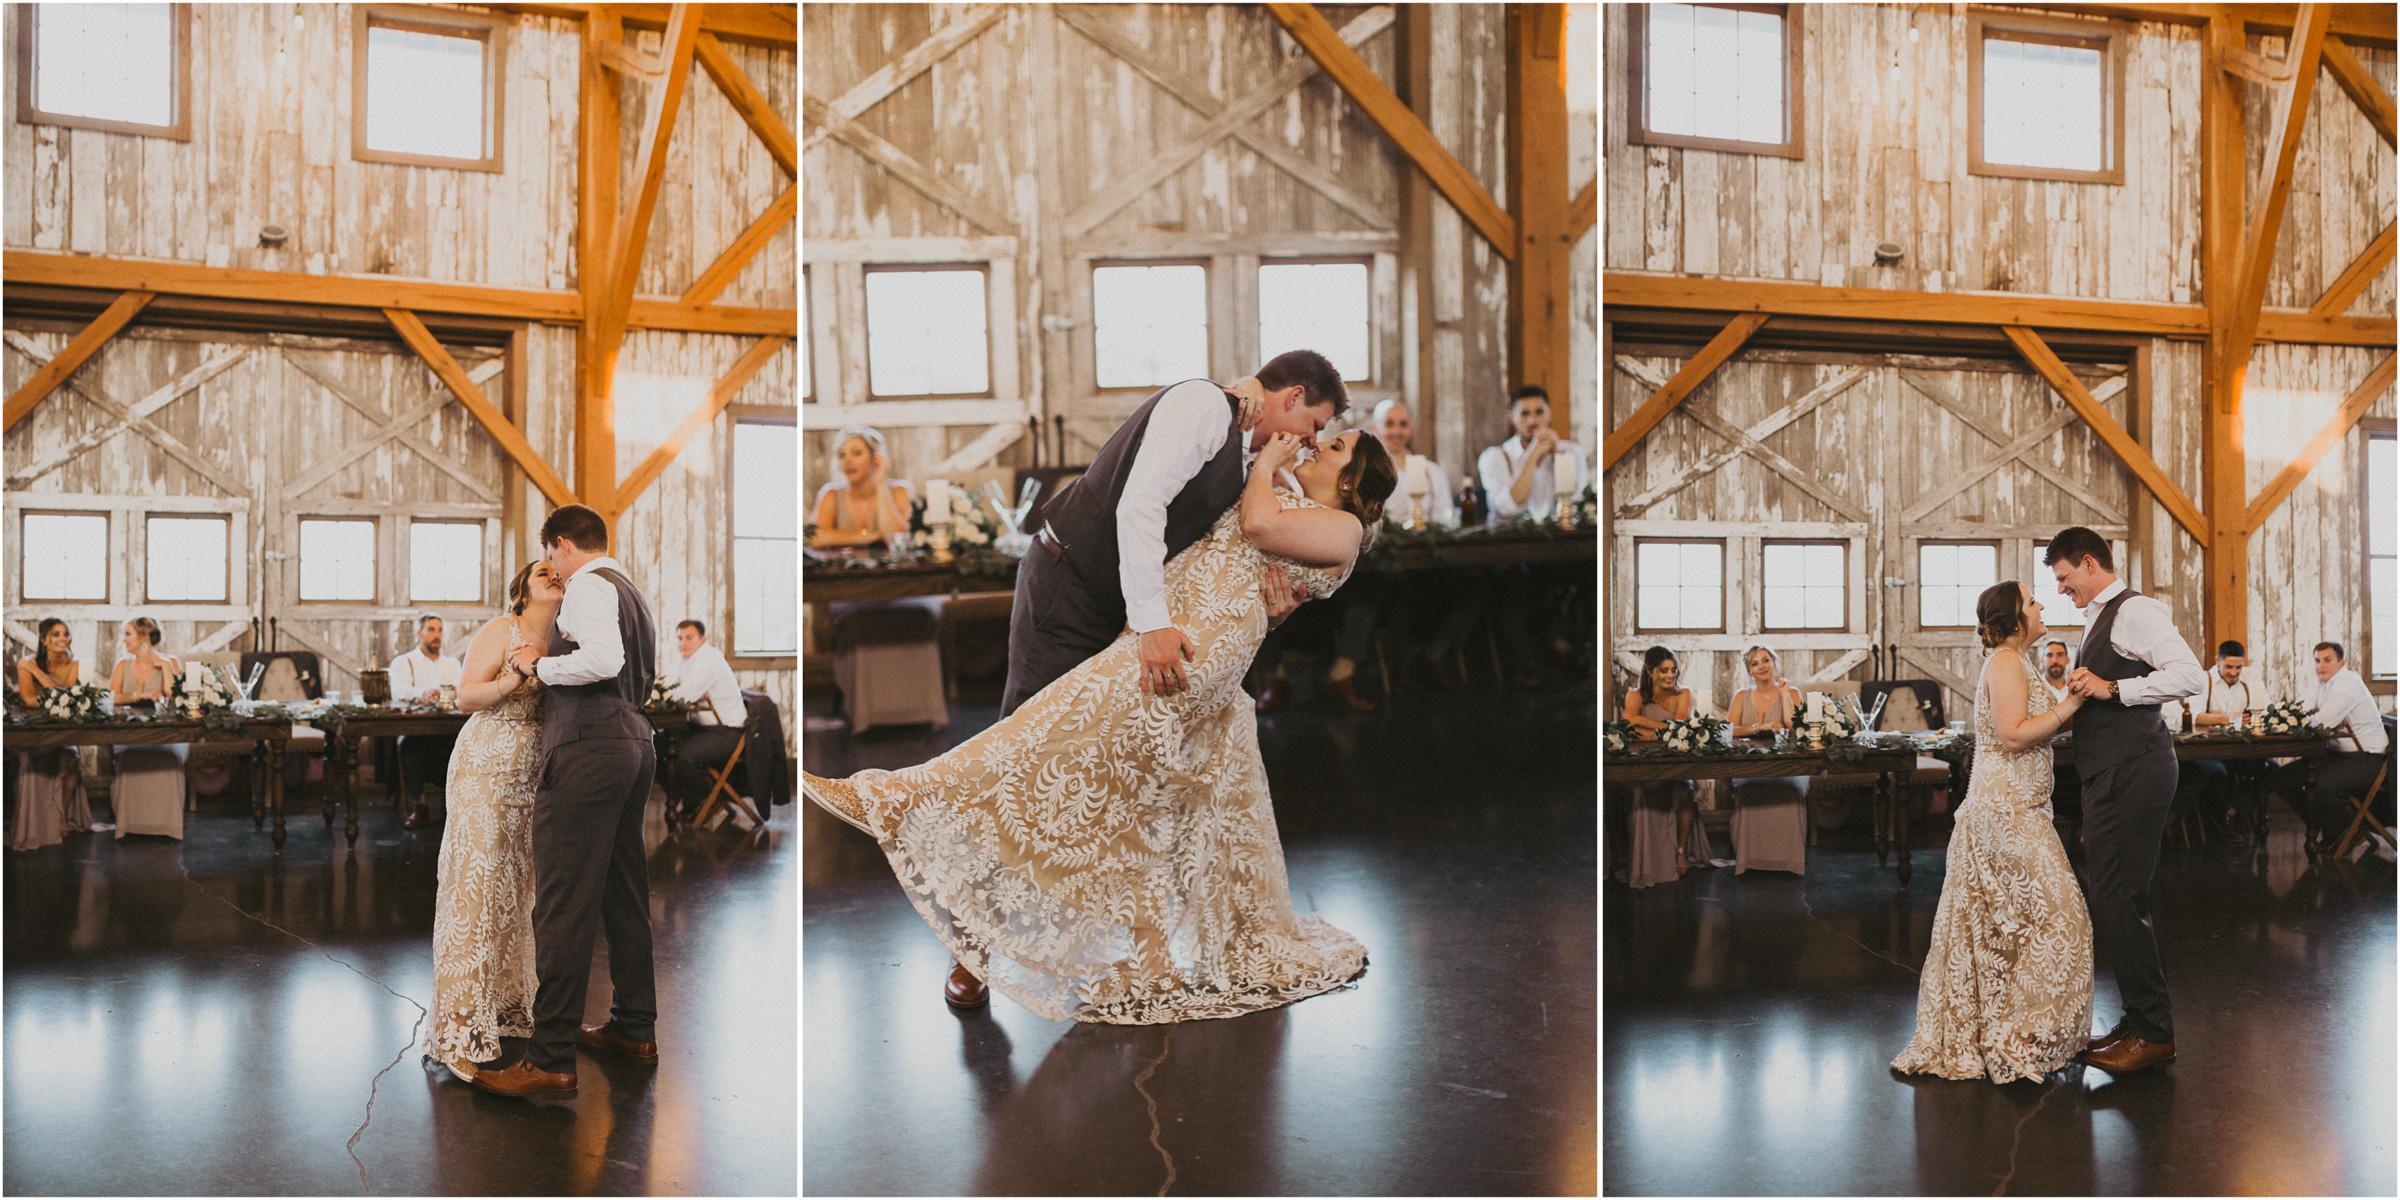 alyssa barletter photography weston red barn farm timberbarn summer outdoor wedding-64.jpg